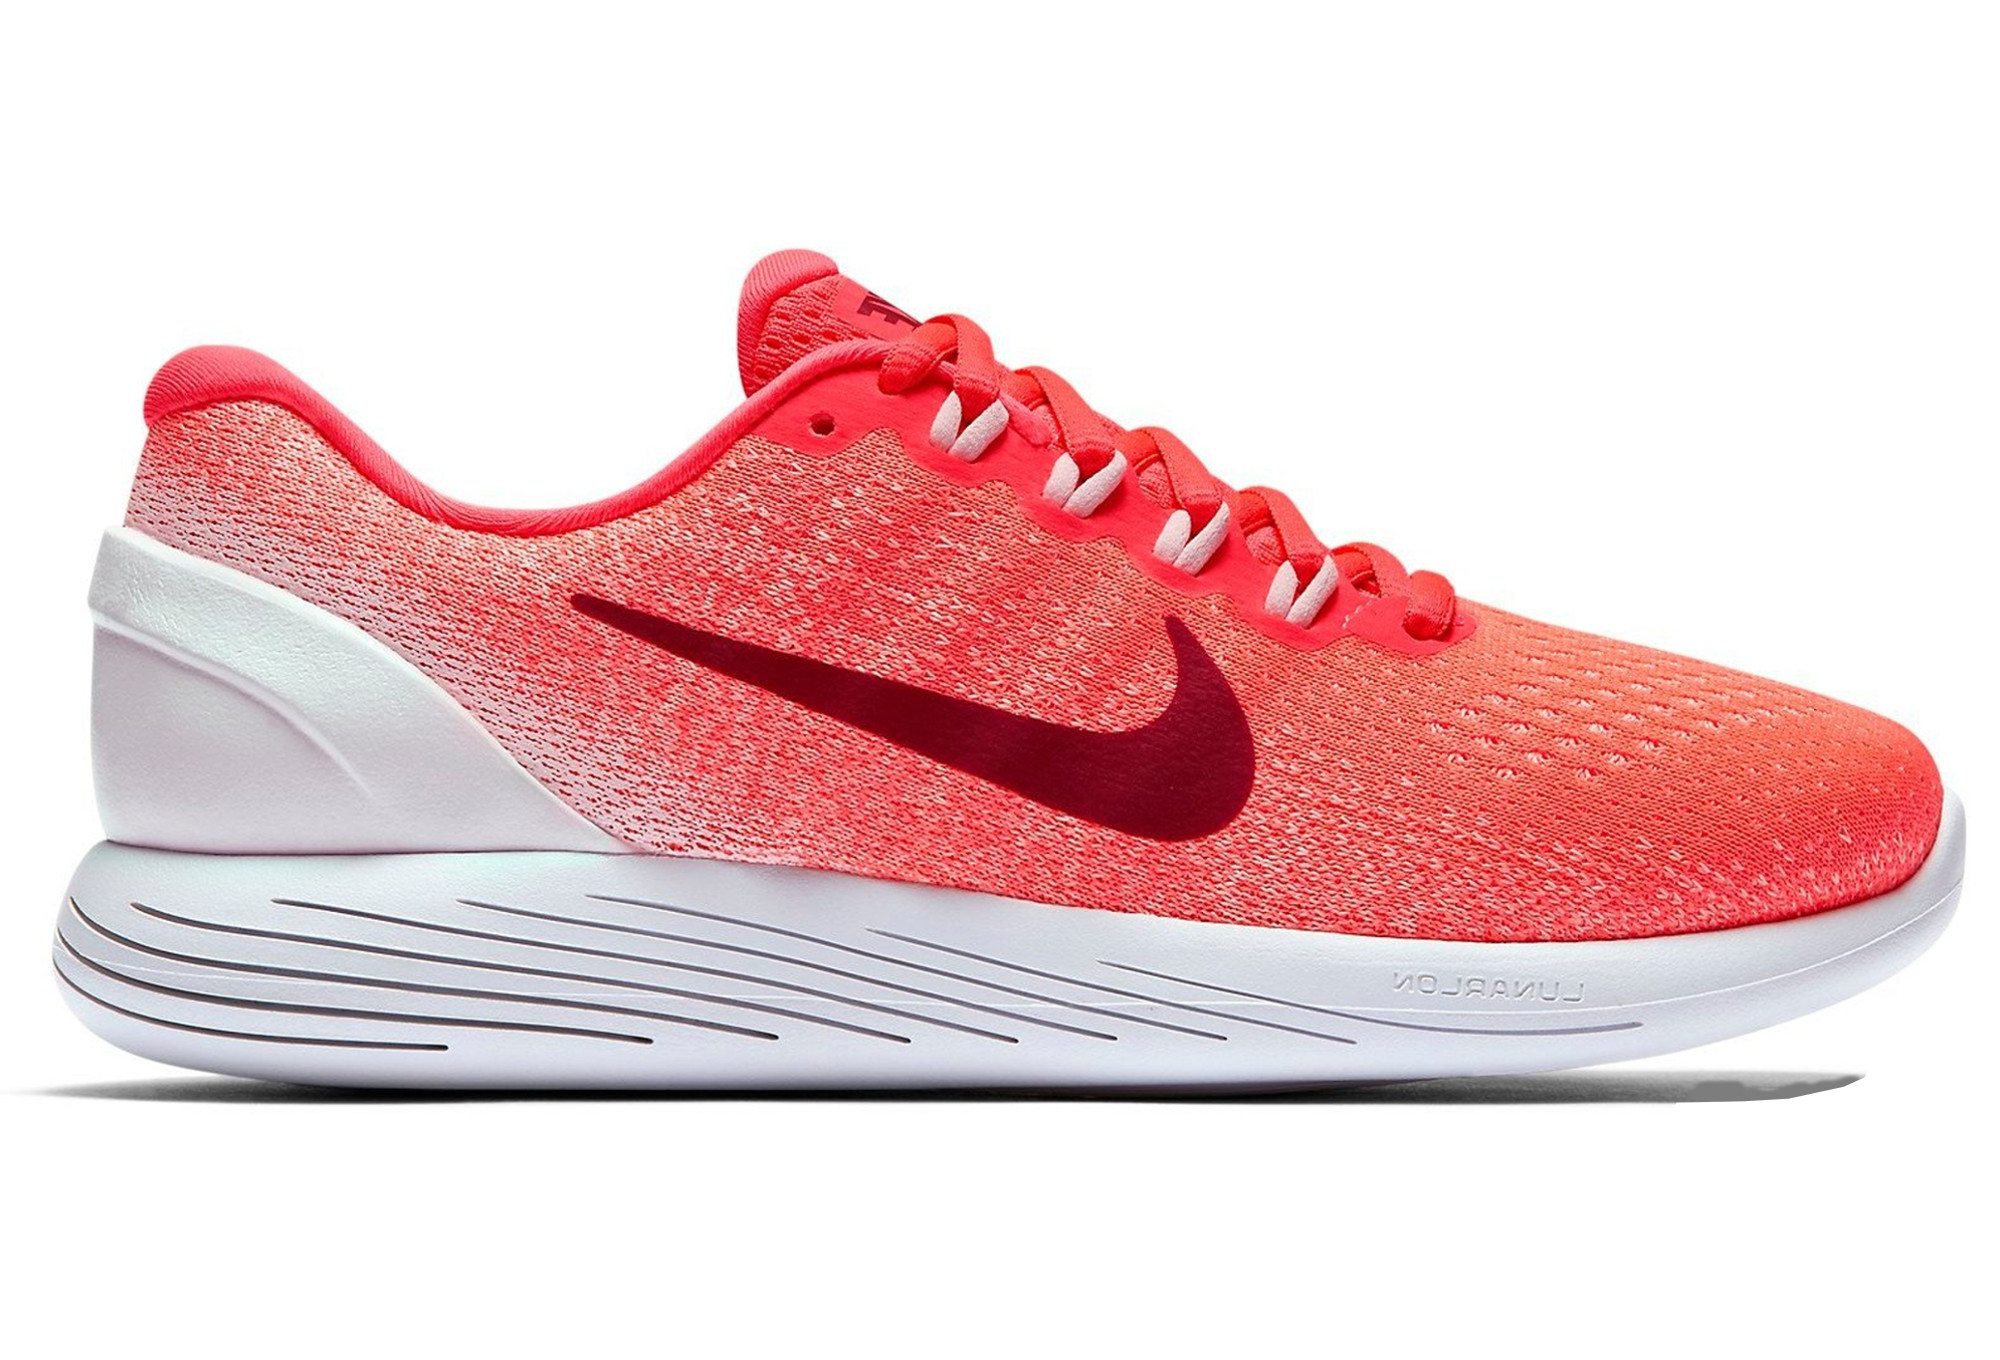 sports shoes 3f236 698cc Chaussures de Running Femme Nike LunarGlide 9 Orange  Rose